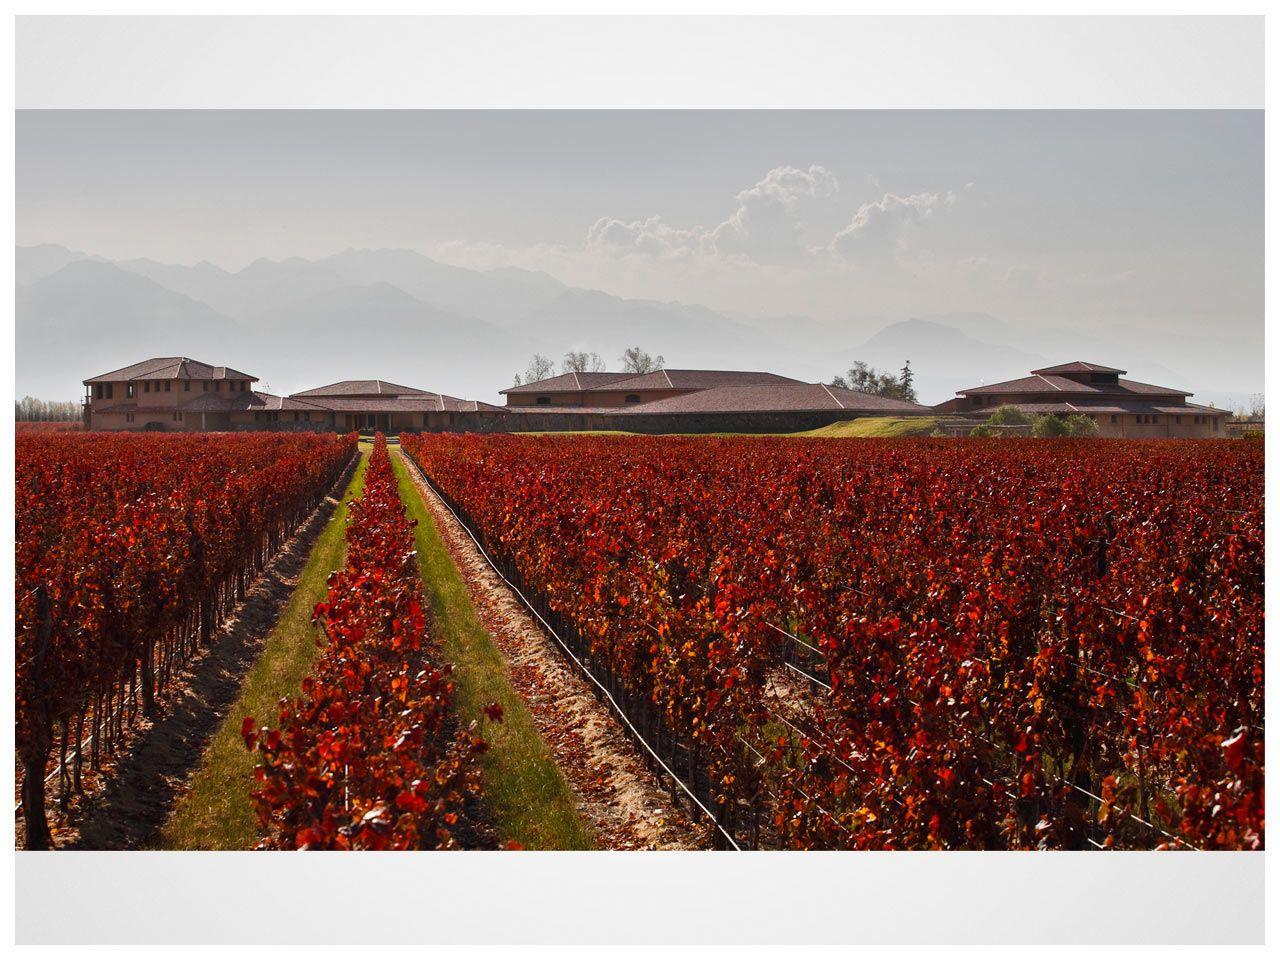 Finca Decero Mendoza Wine Vineyards Vineyard Winery